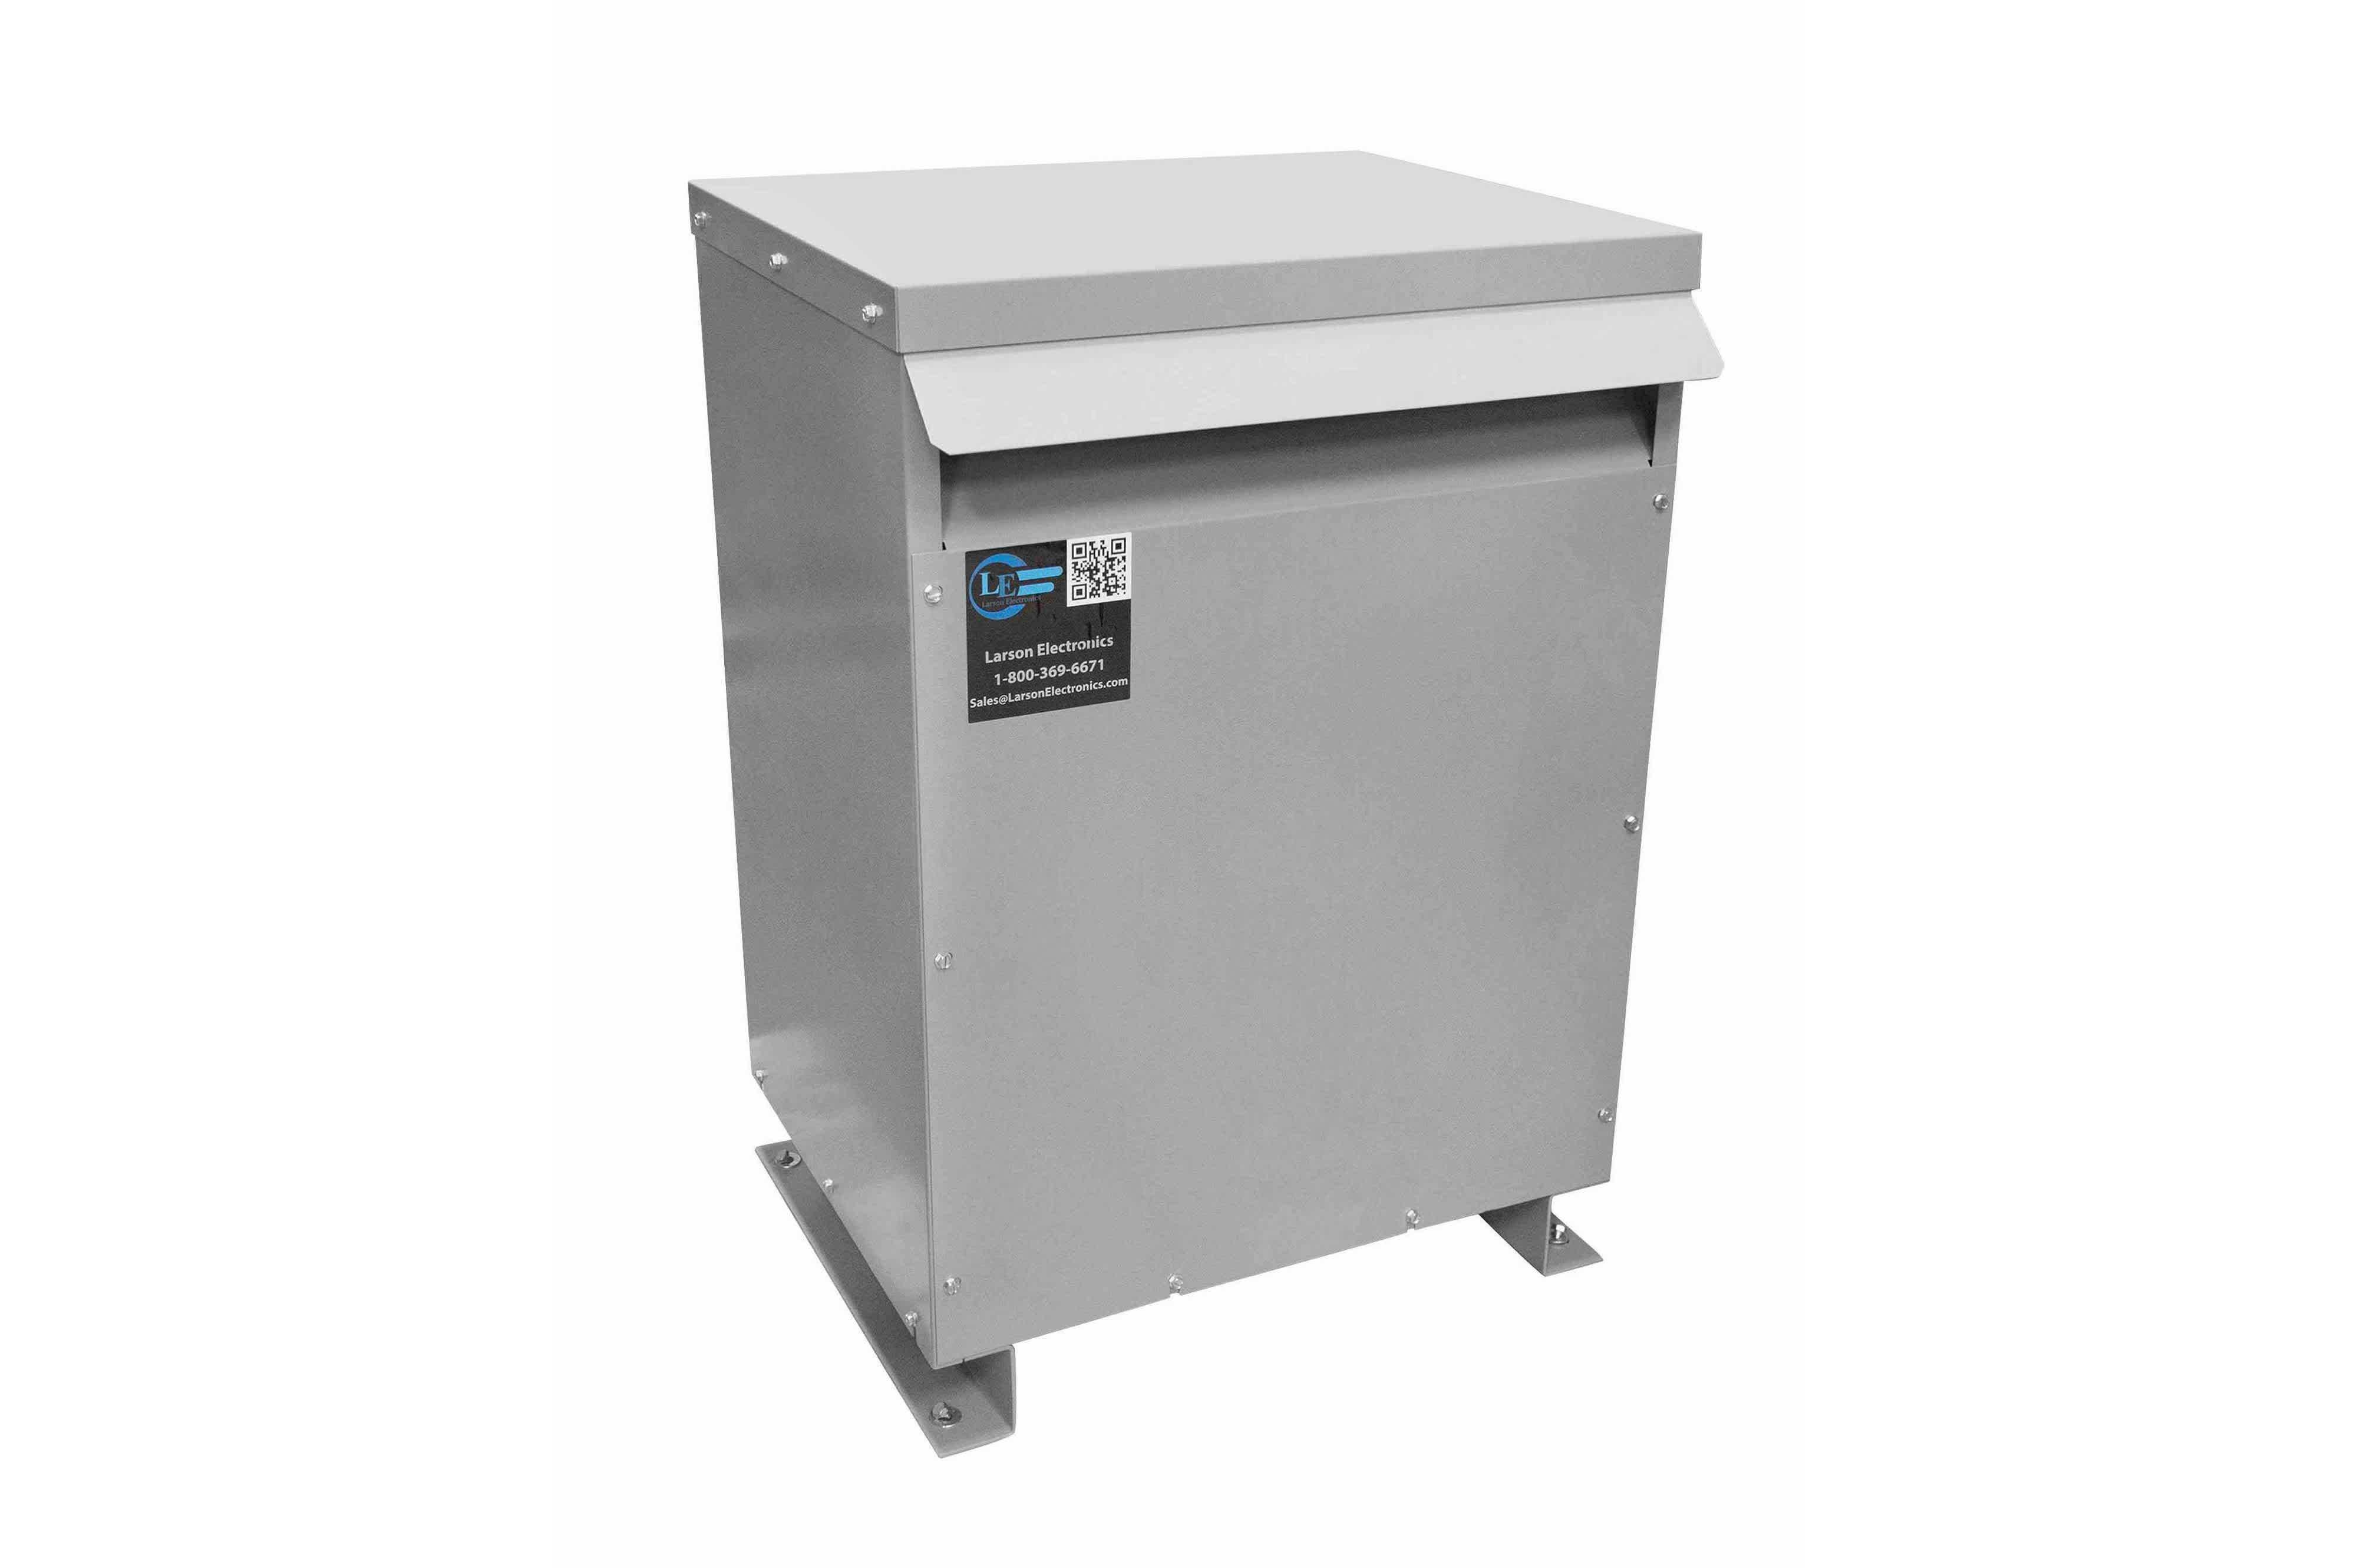 175 kVA 3PH Isolation Transformer, 400V Wye Primary, 240V/120 Delta Secondary, N3R, Ventilated, 60 Hz